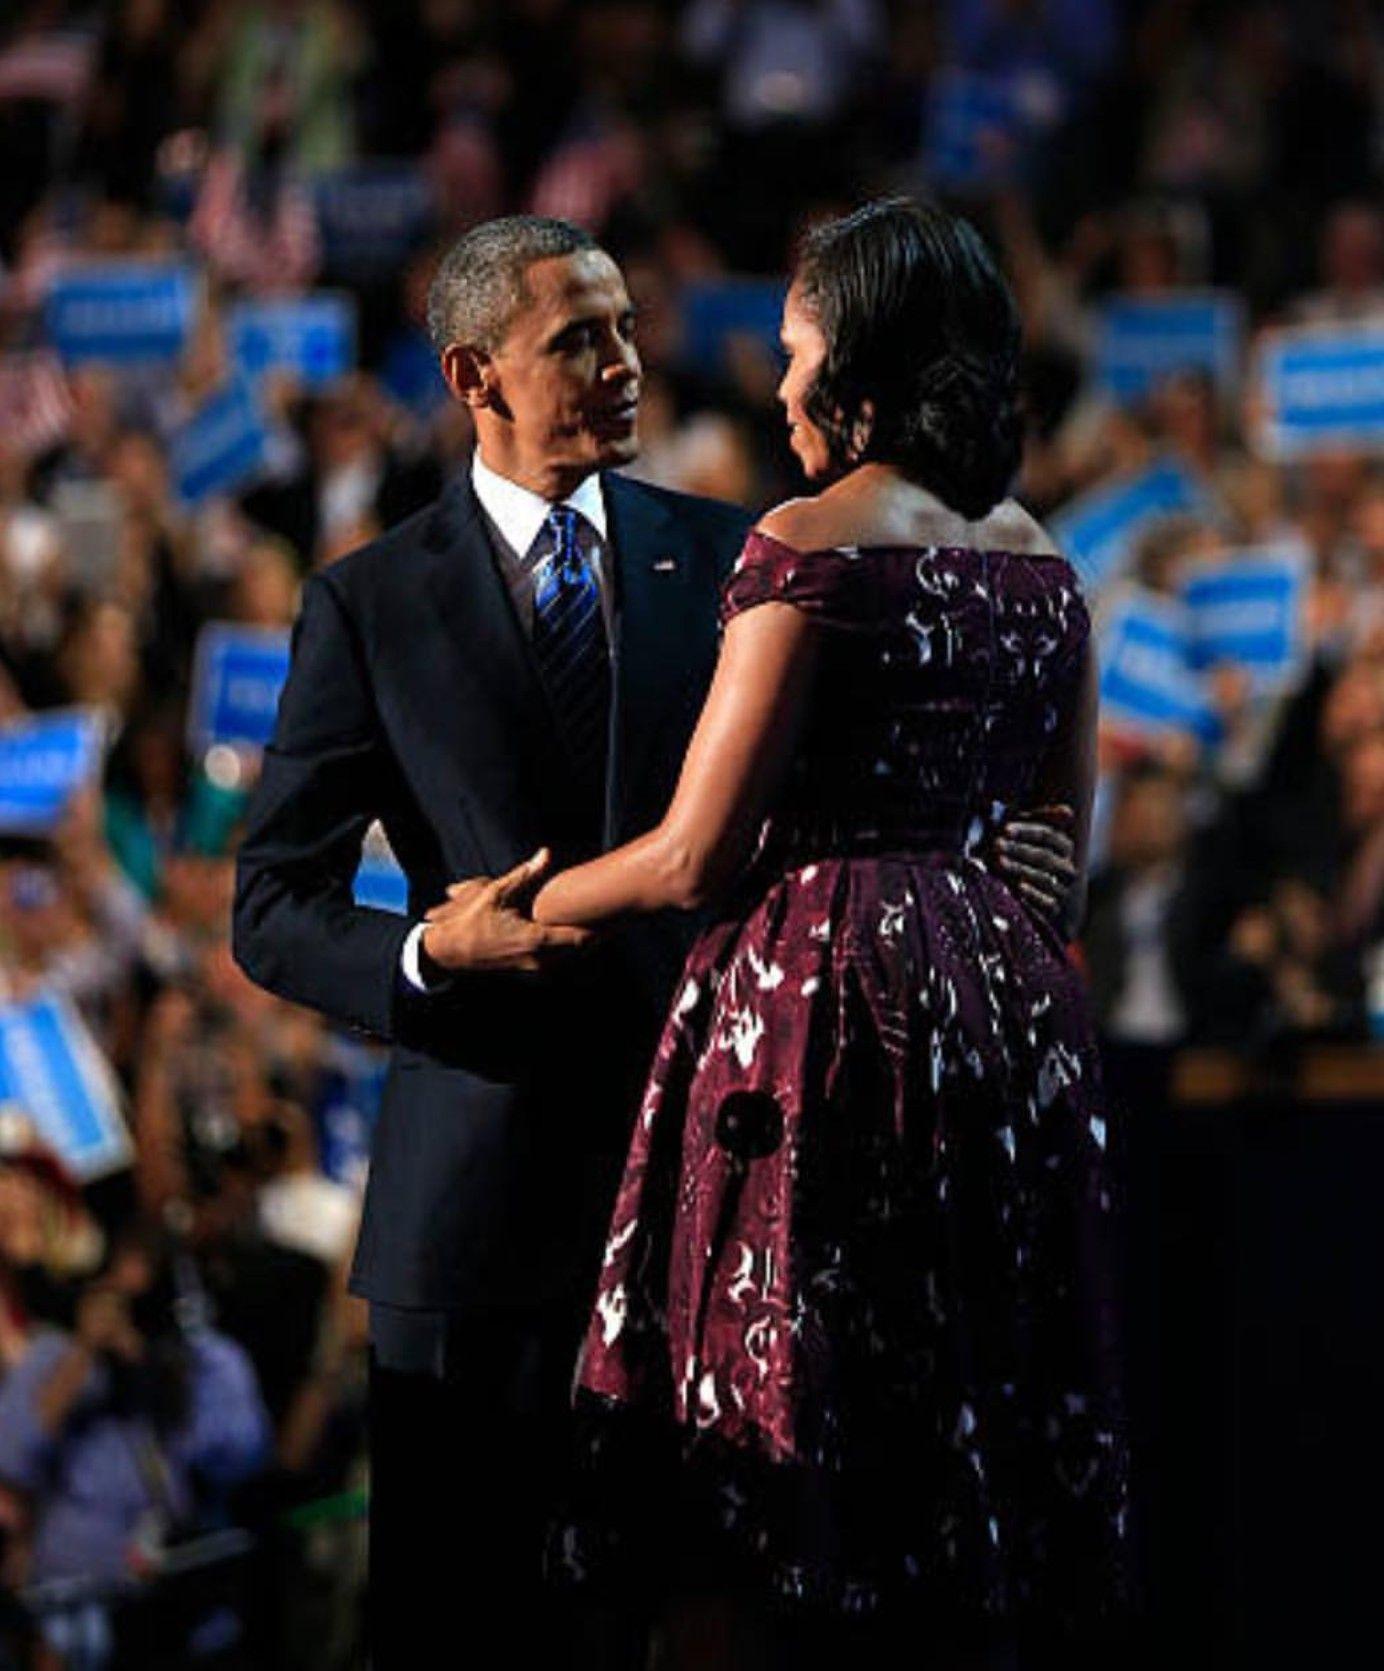 President Barack Obama and FLOTUS Michelle